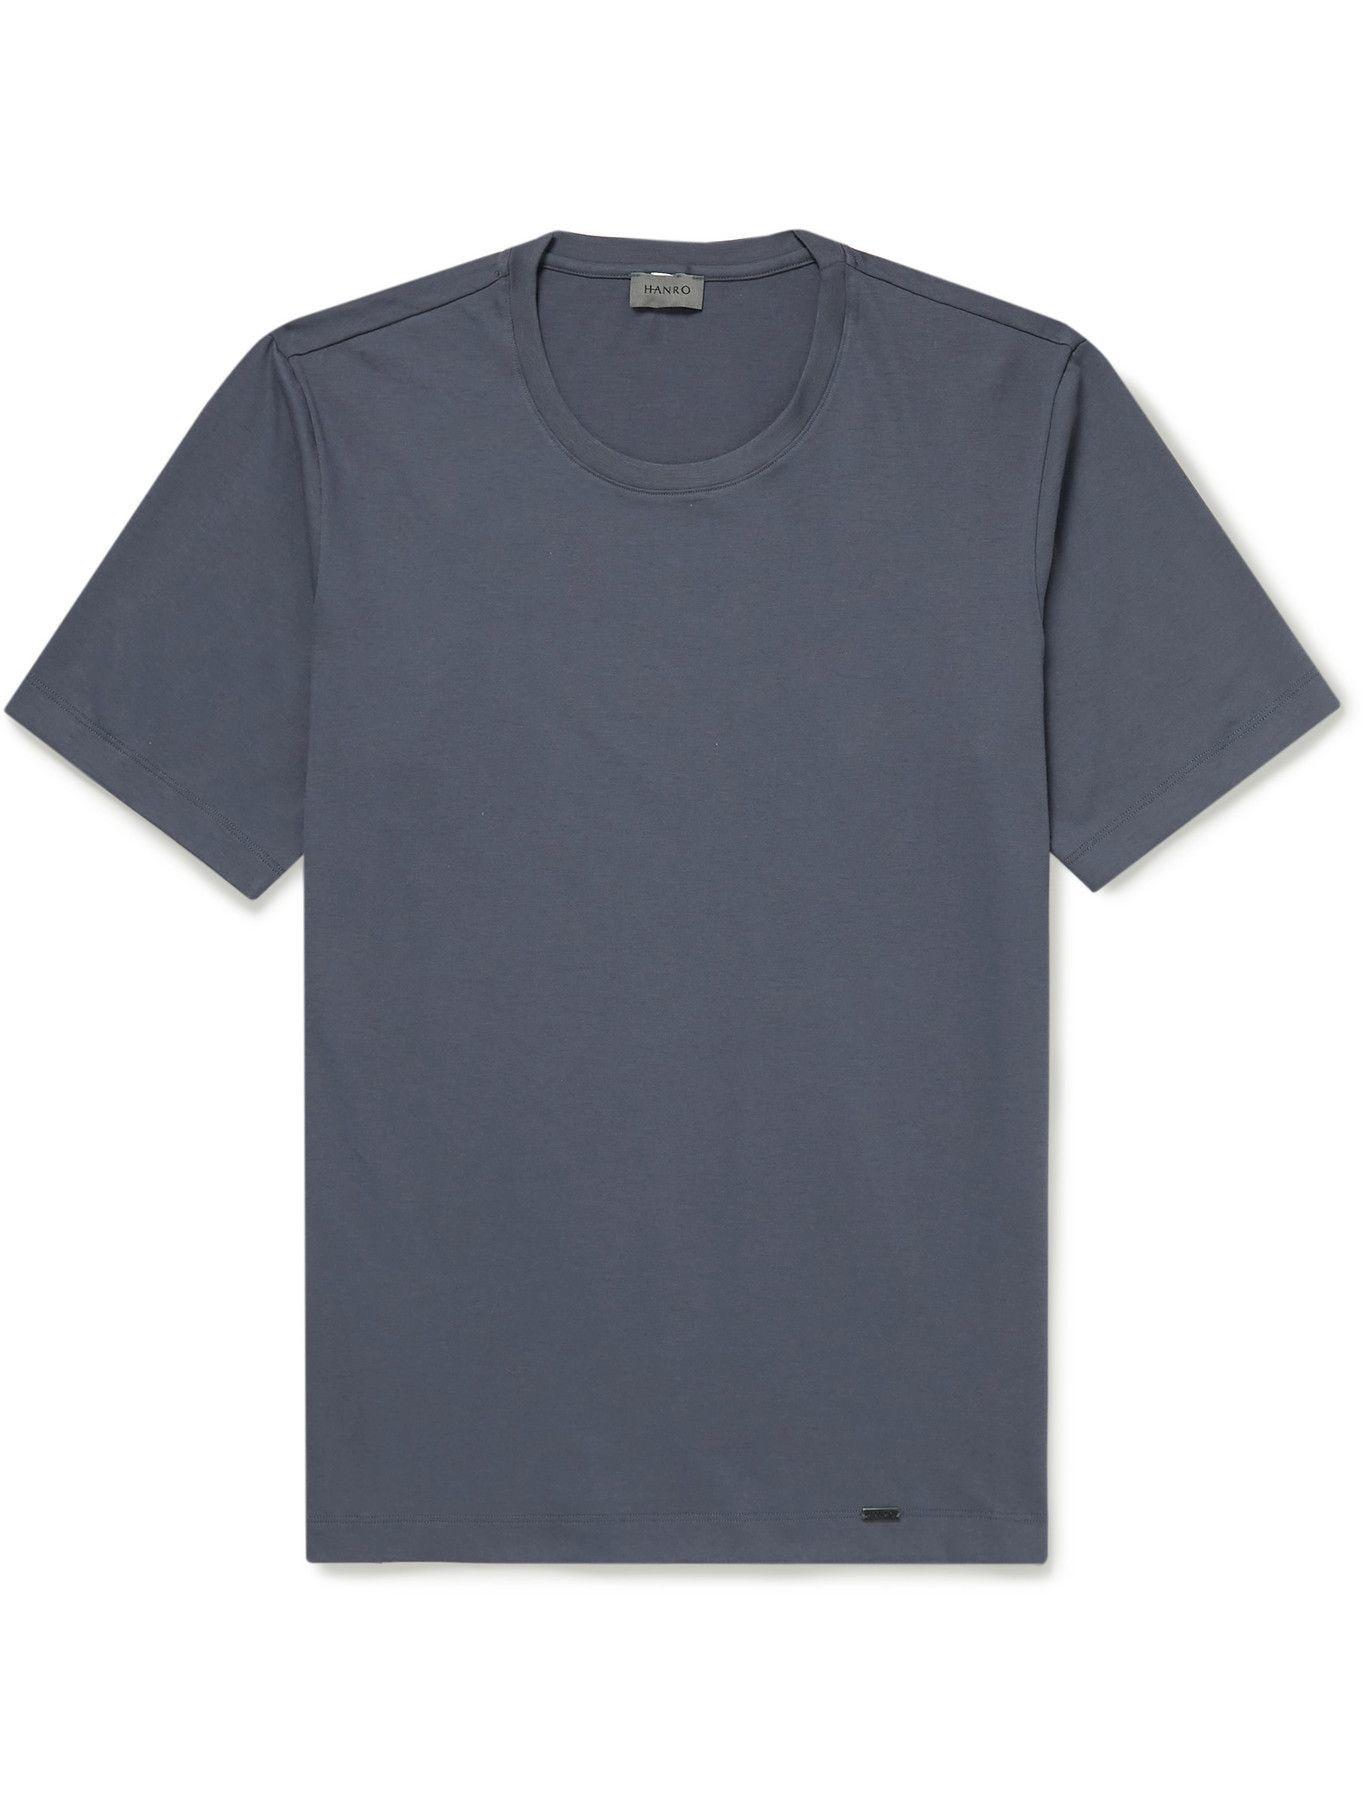 HANRO - Living Cotton-Jersey T-Shirt - Blue